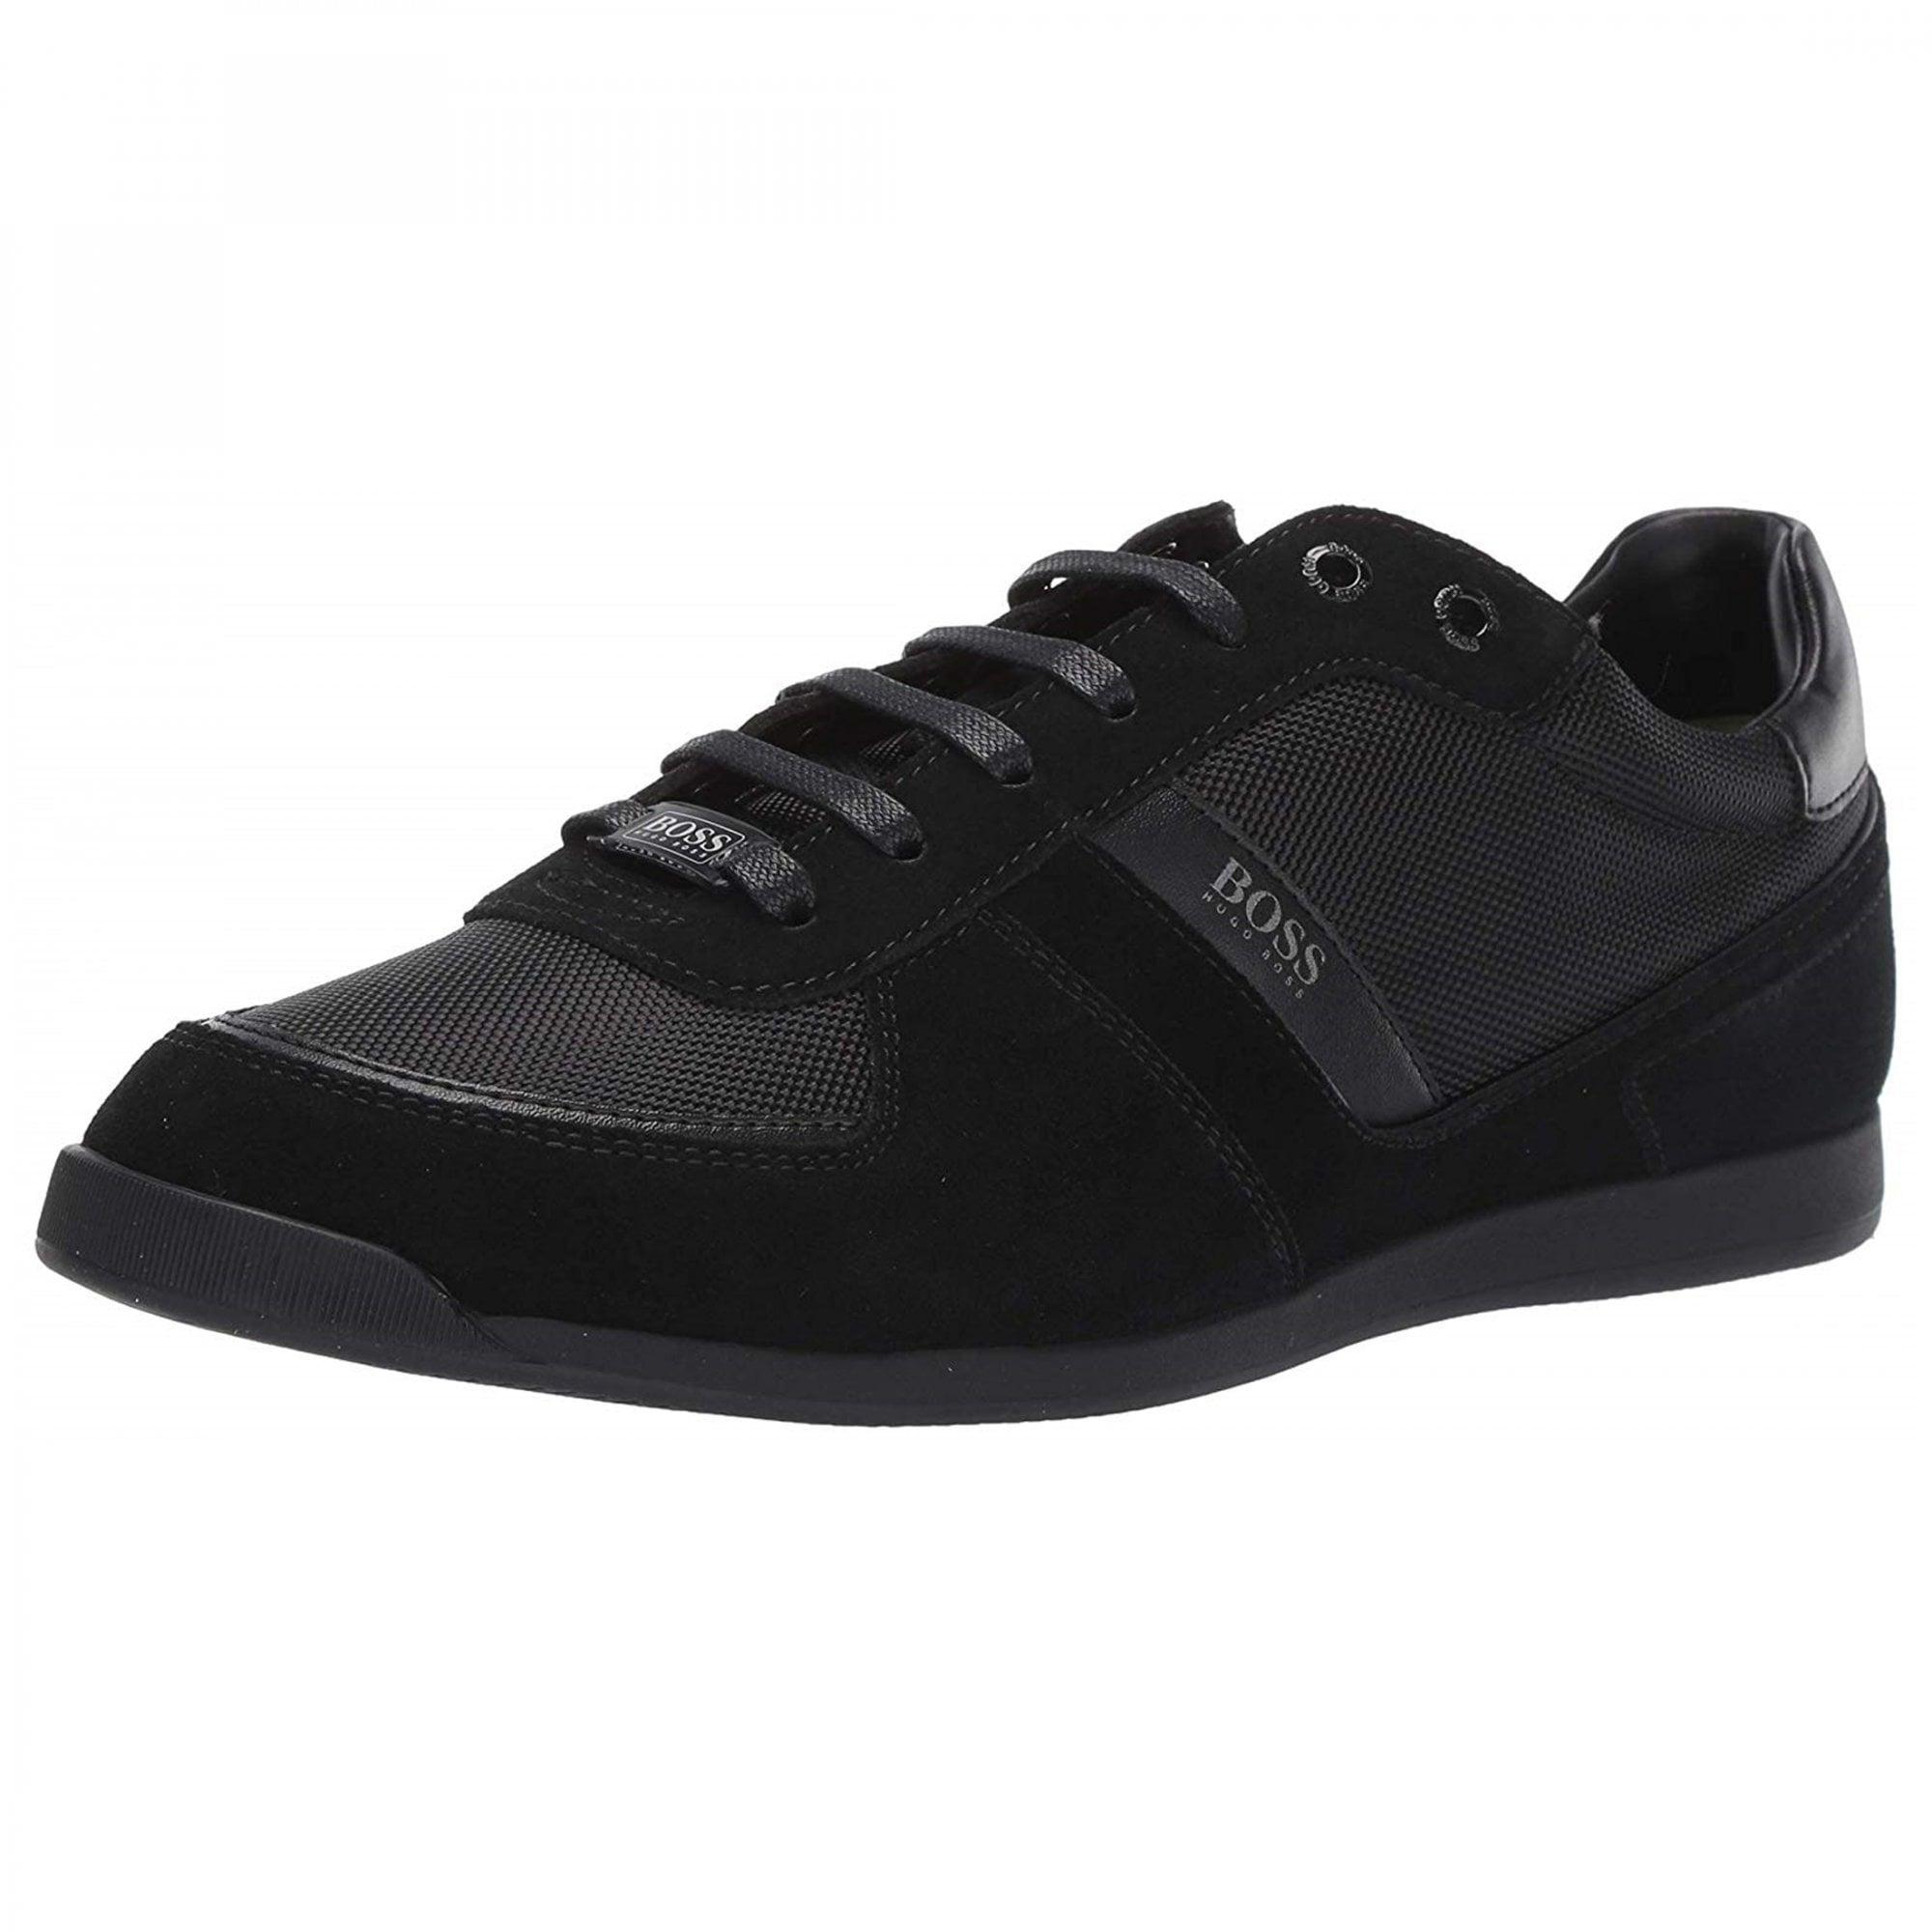 Black Trainers 50407903 - Hugo Boss